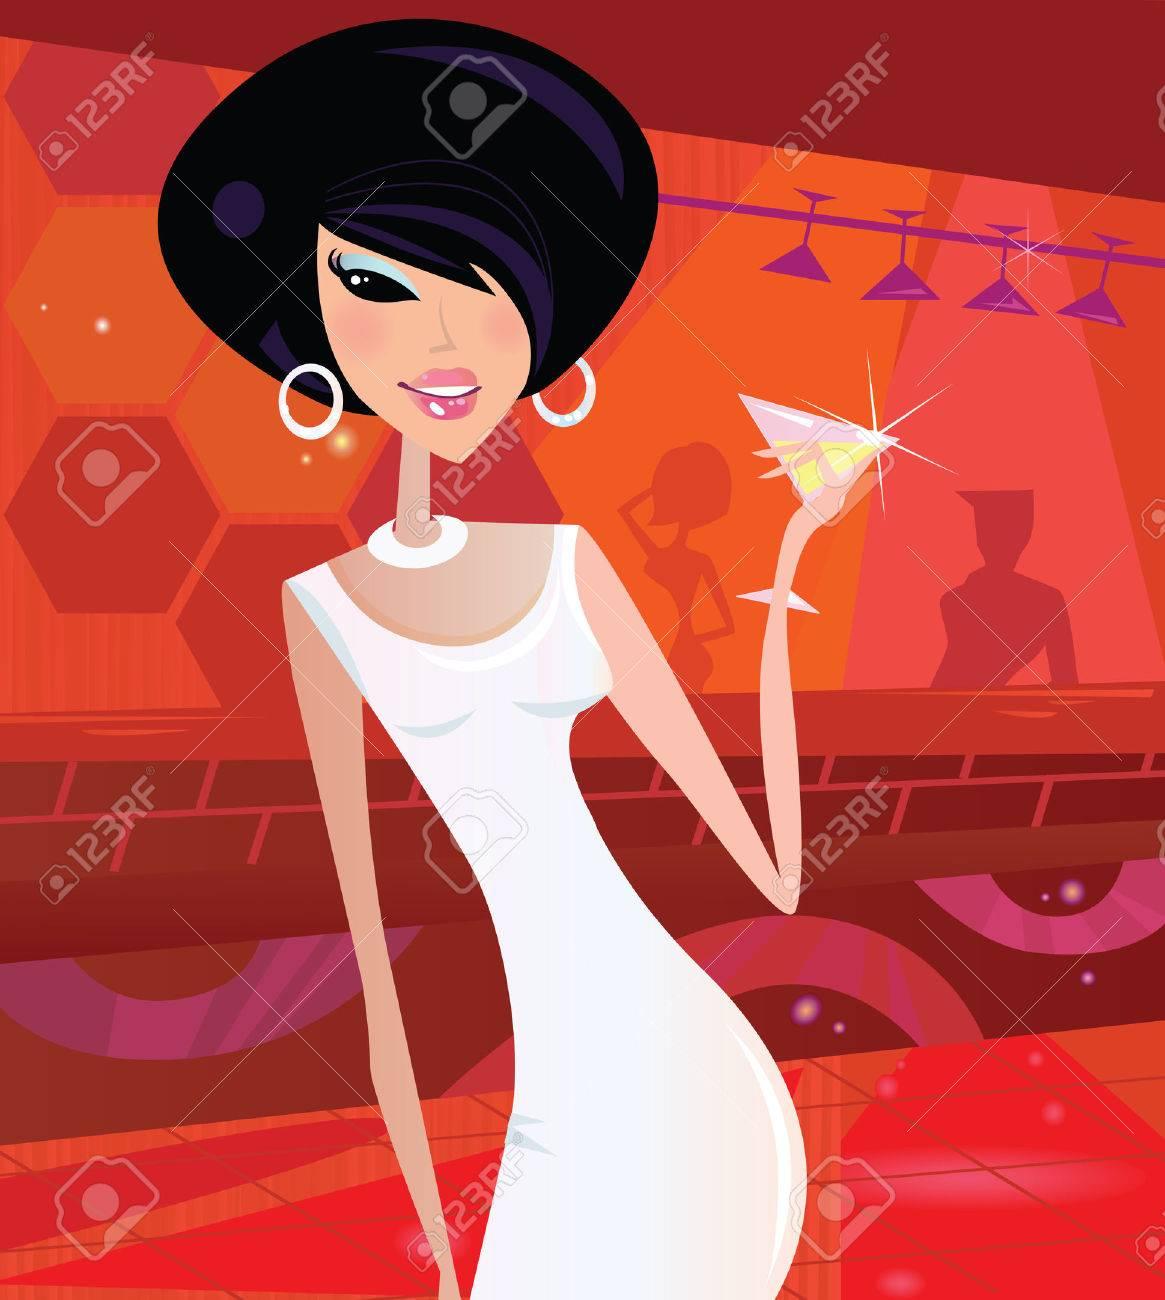 Sexy retro woman in night club. Queen of the disco! Vector Illustration in retro style. Stock Vector - 6124996